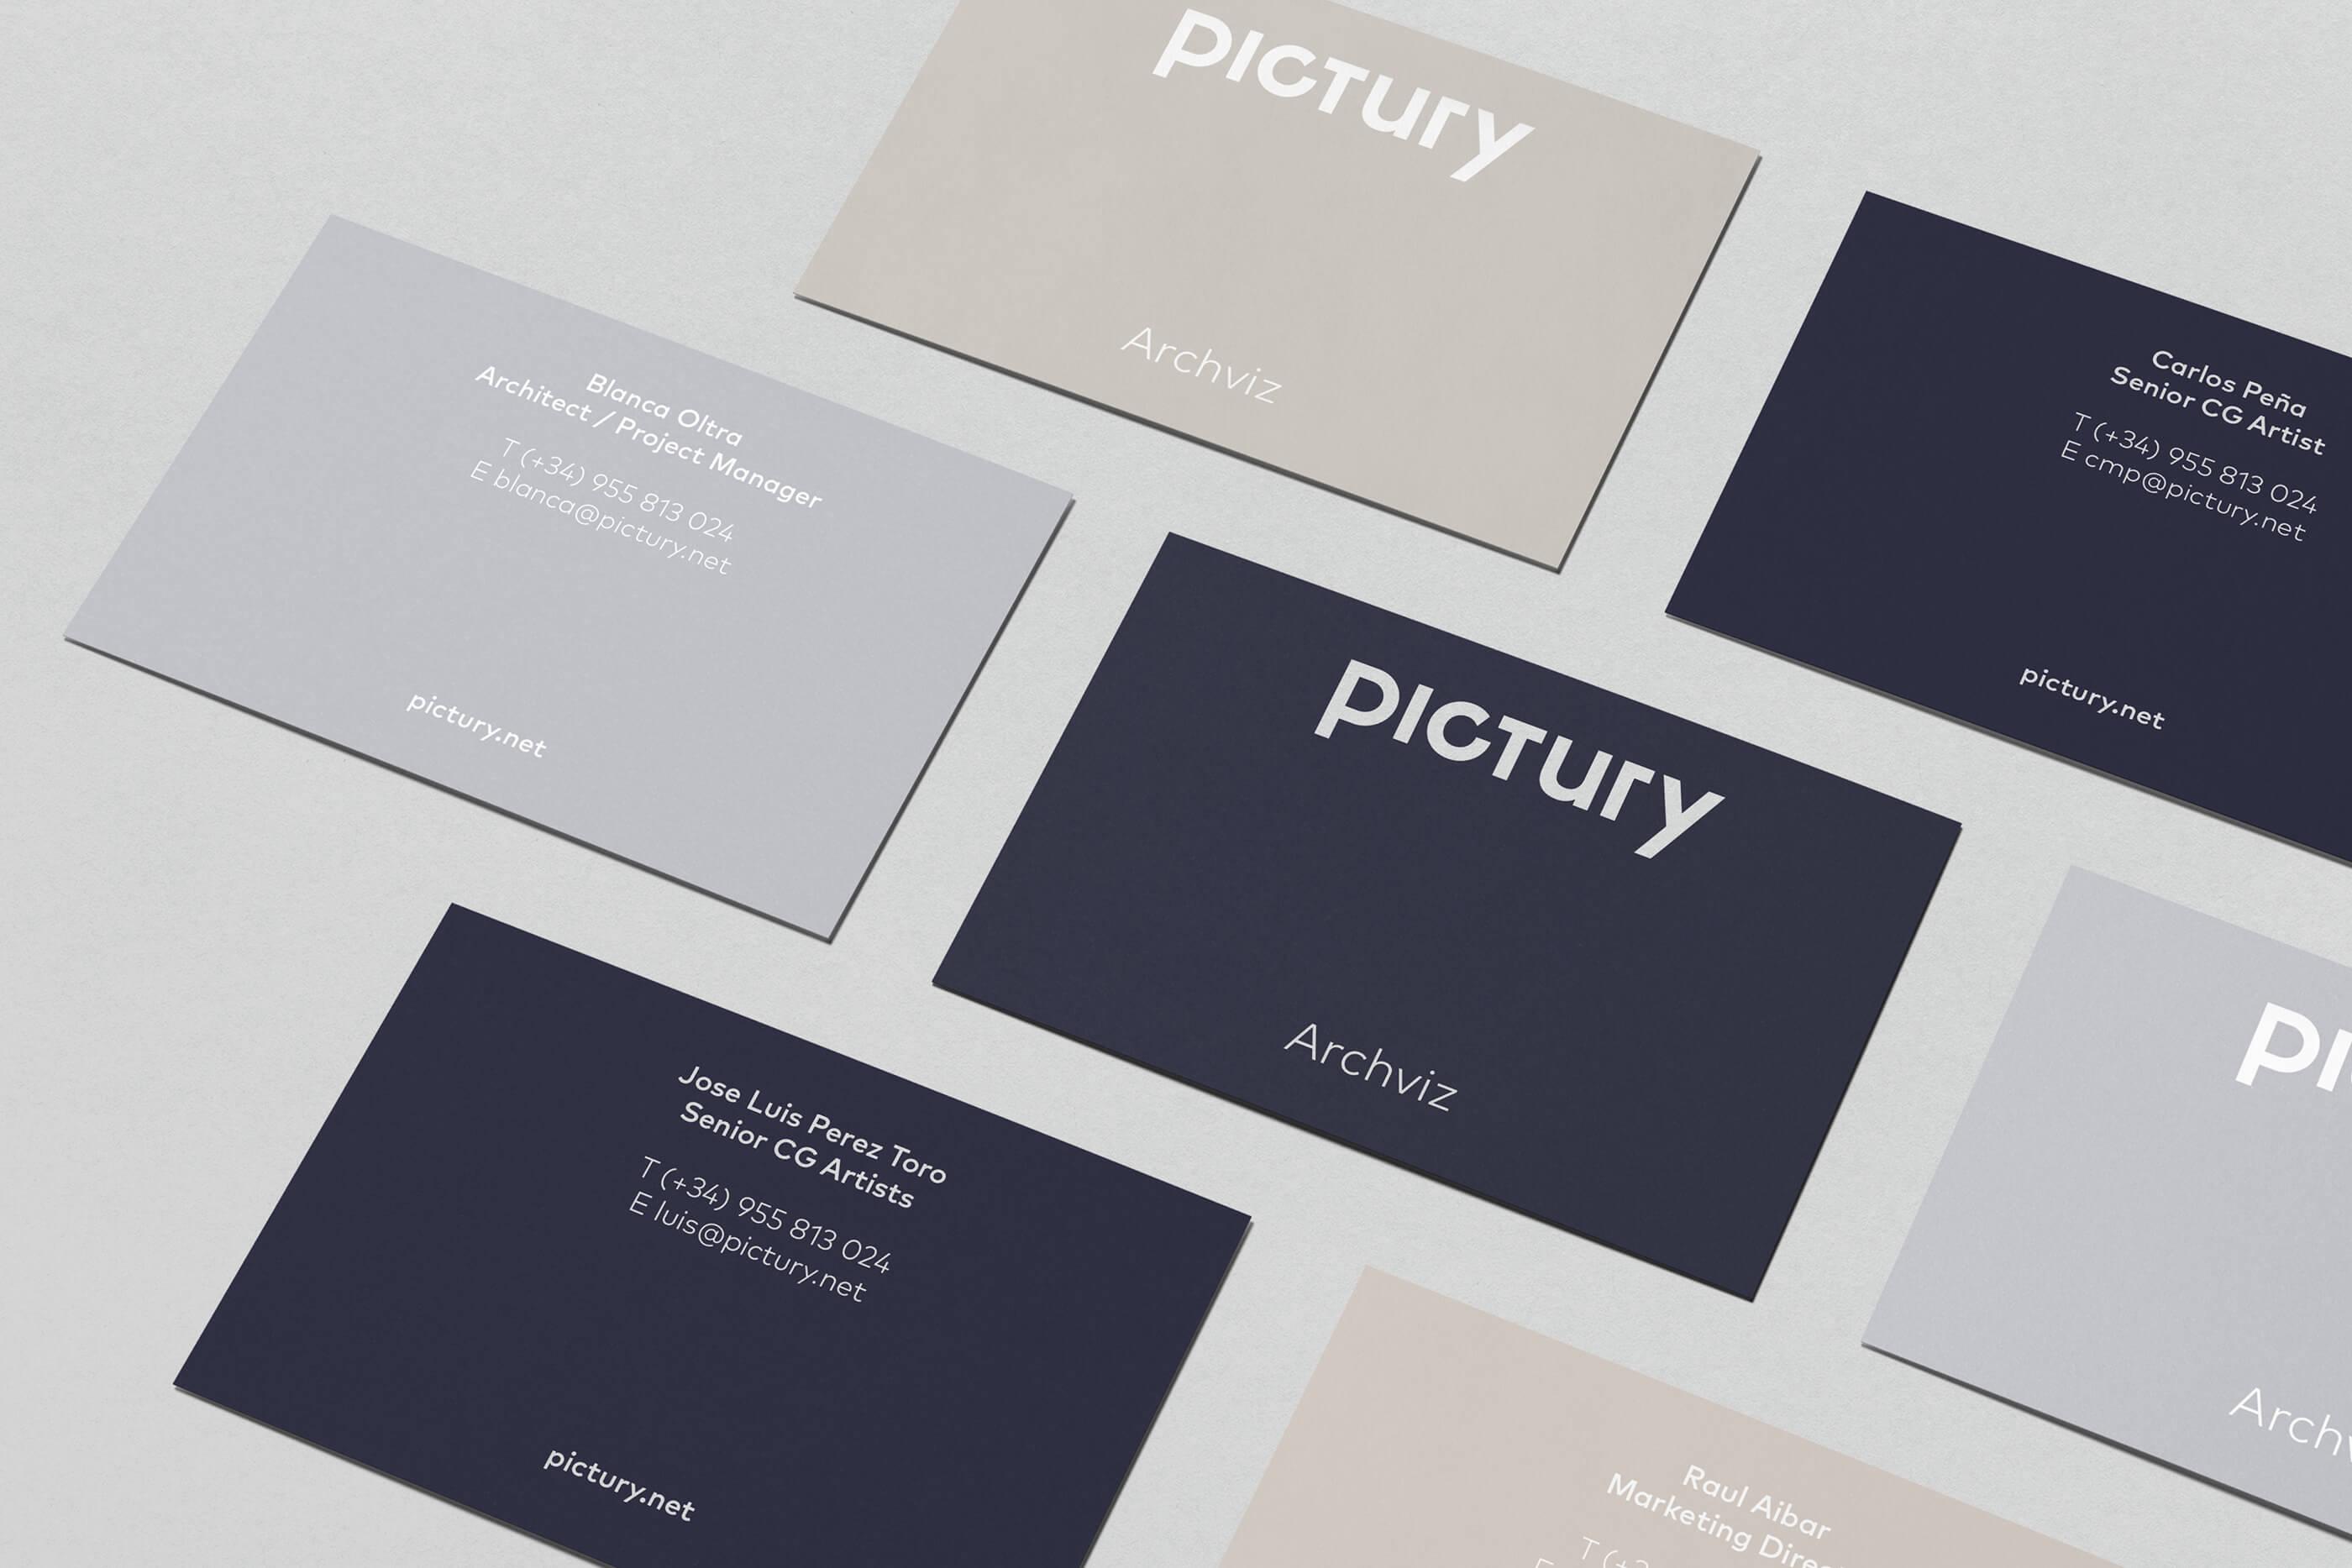 Pictury 5